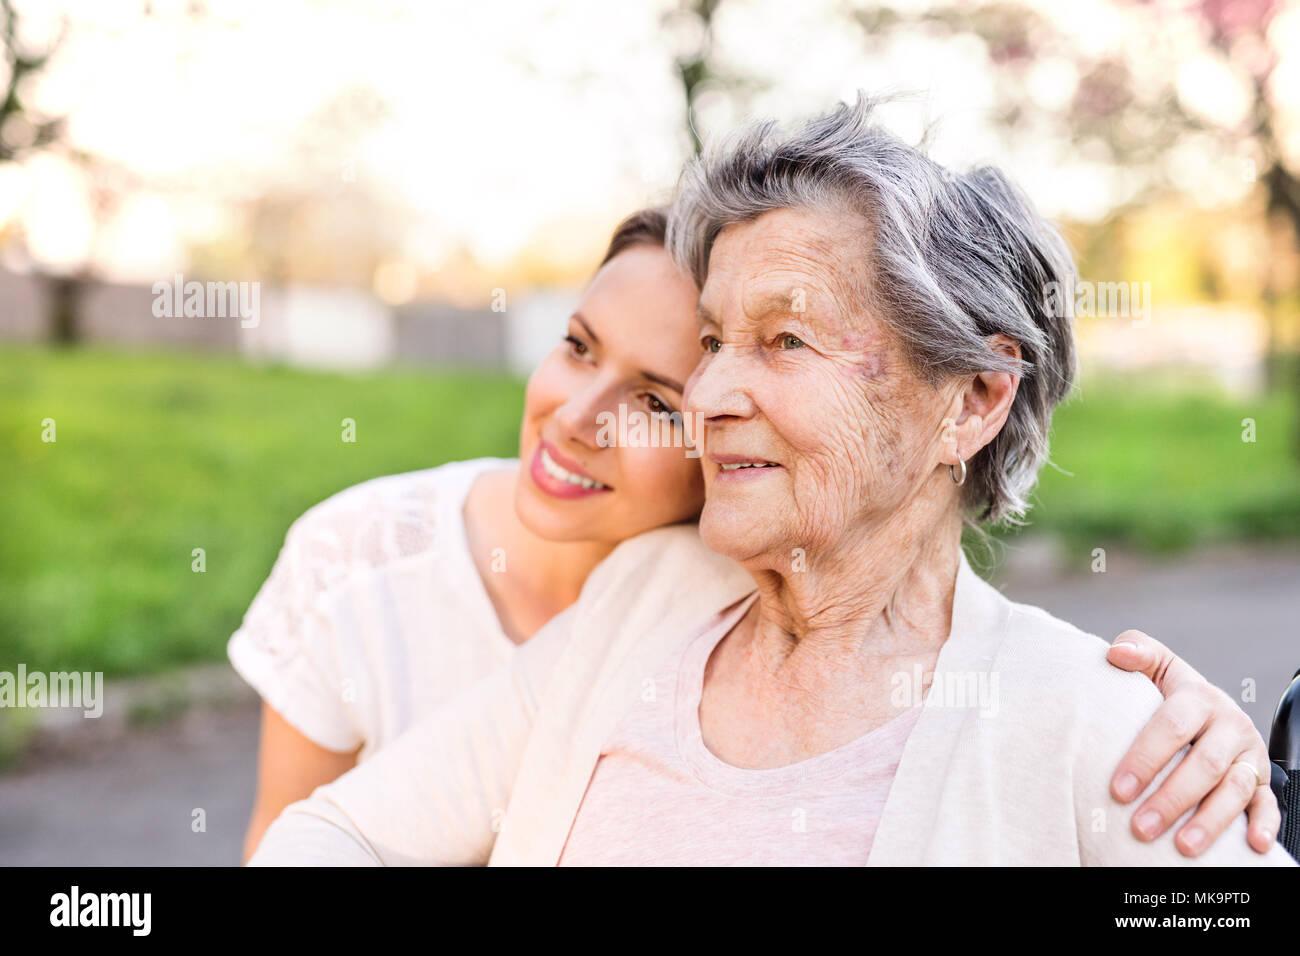 Elderly grandmother and granddaughter hugging in spring nature. - Stock Image